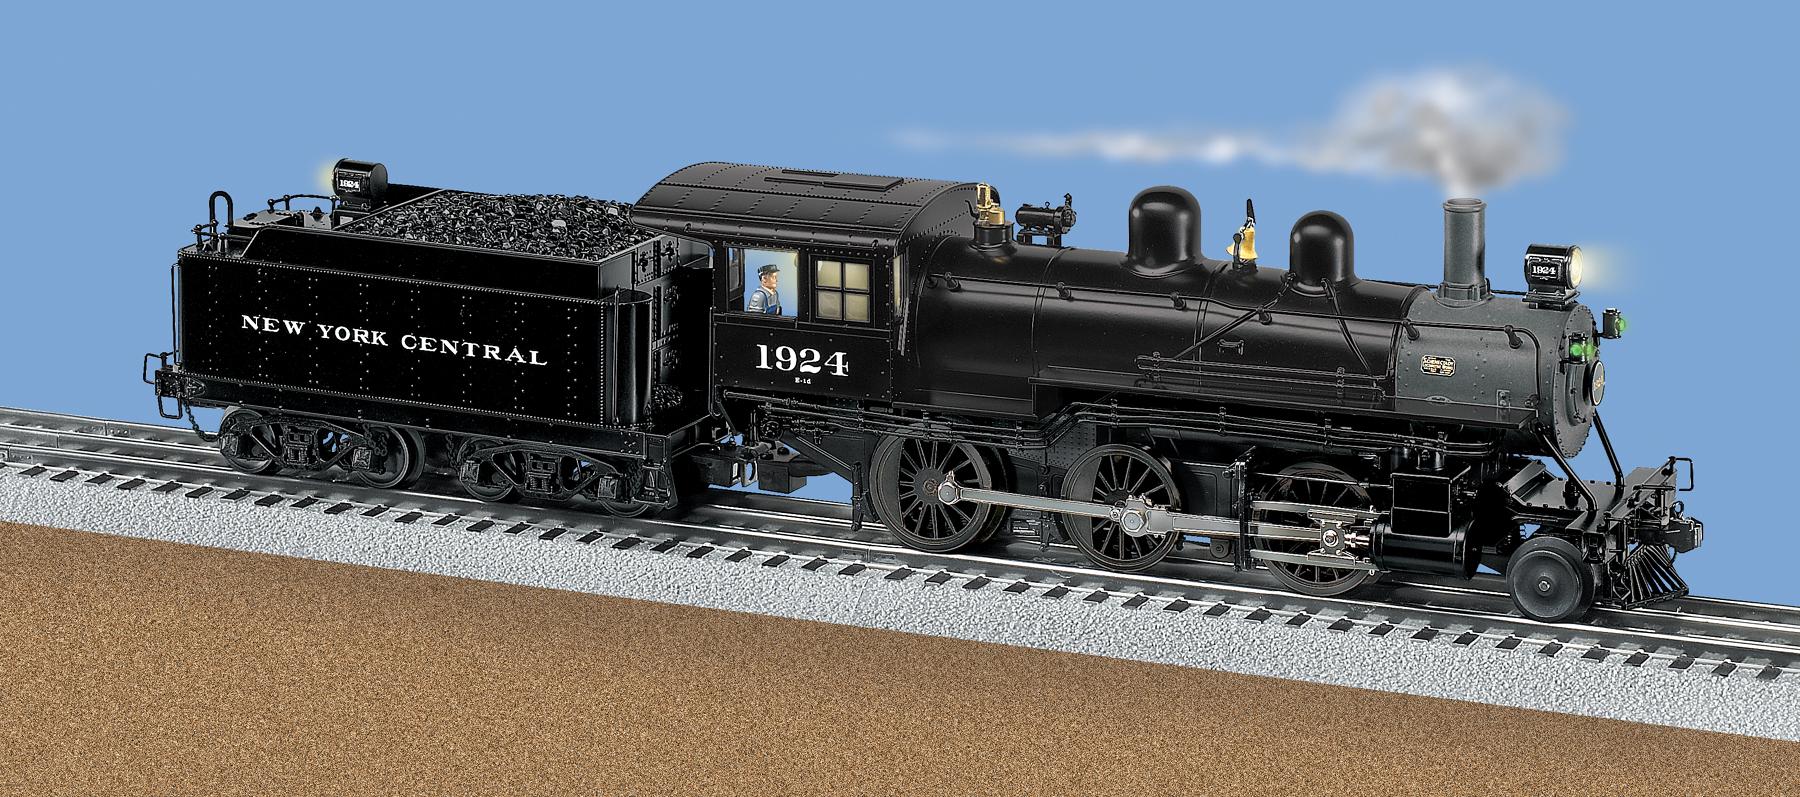 hight resolution of new york central tmcc scale 2 6 0 mogul steam locomotive 1924 rh lionel com lionel lionel locomotive wiring diagram